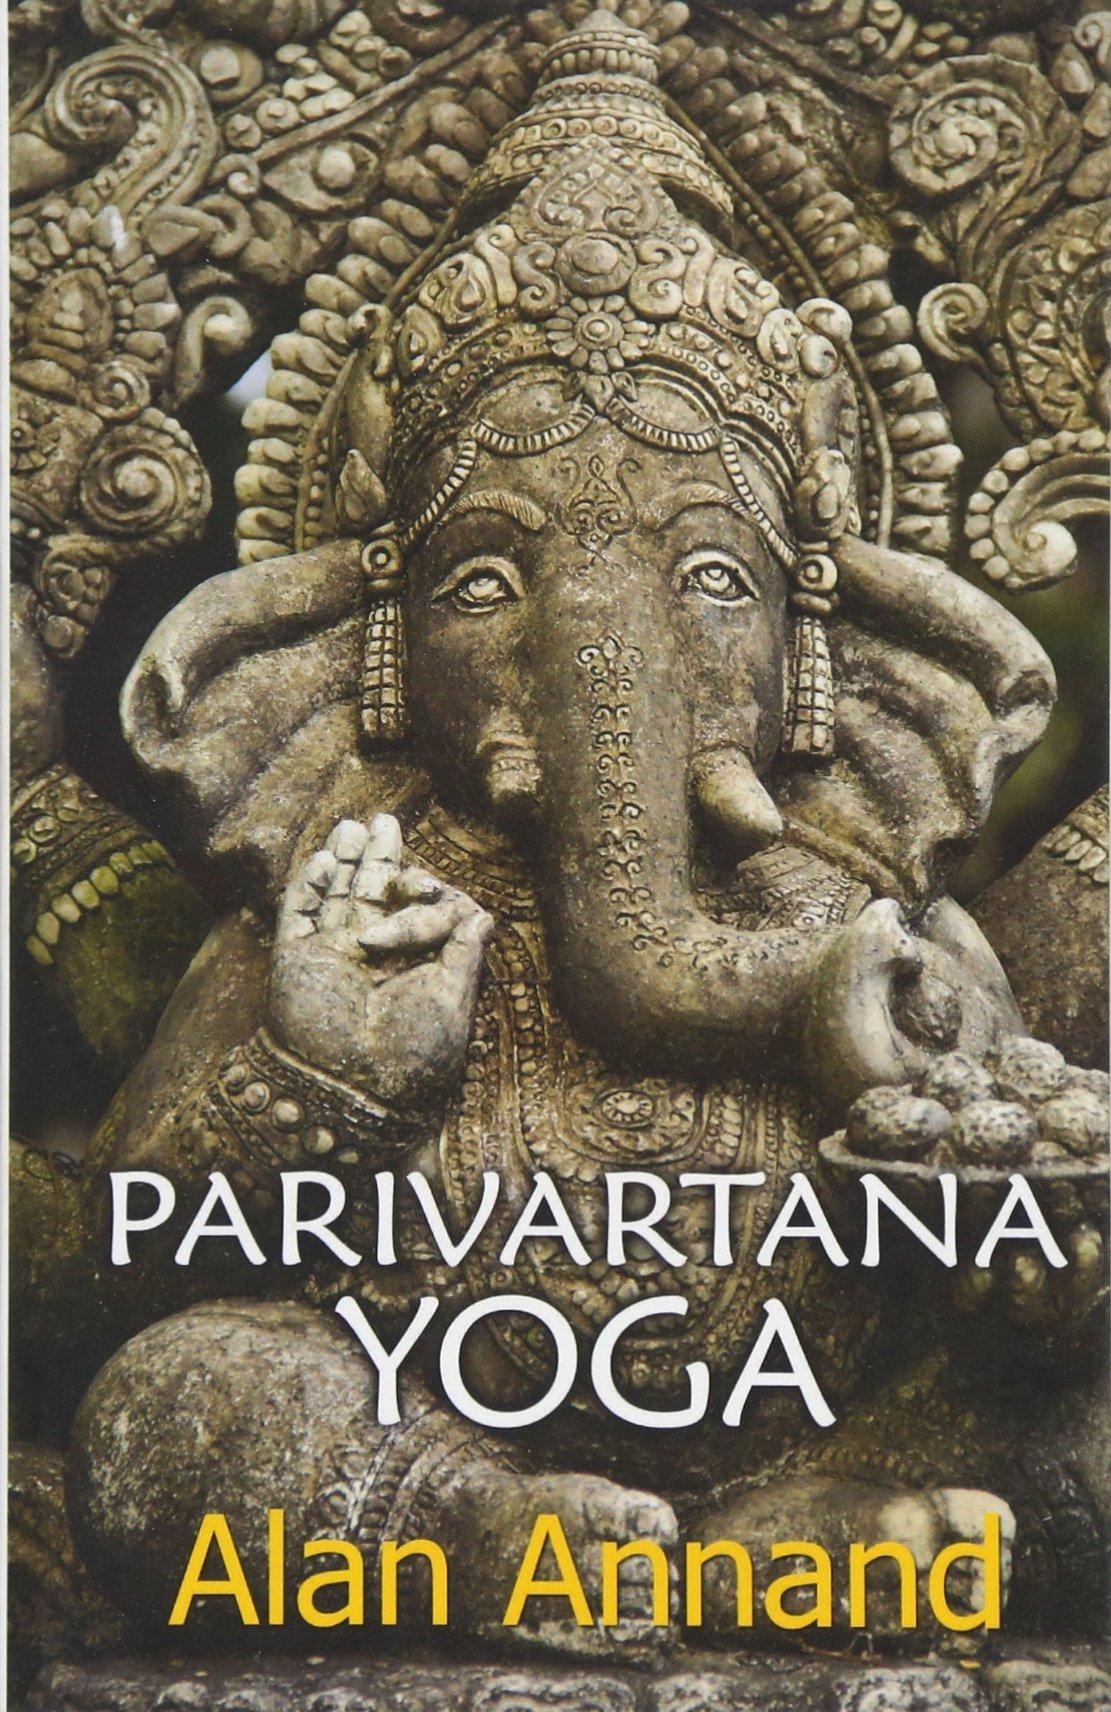 Parivartan yoga in vedic astrology